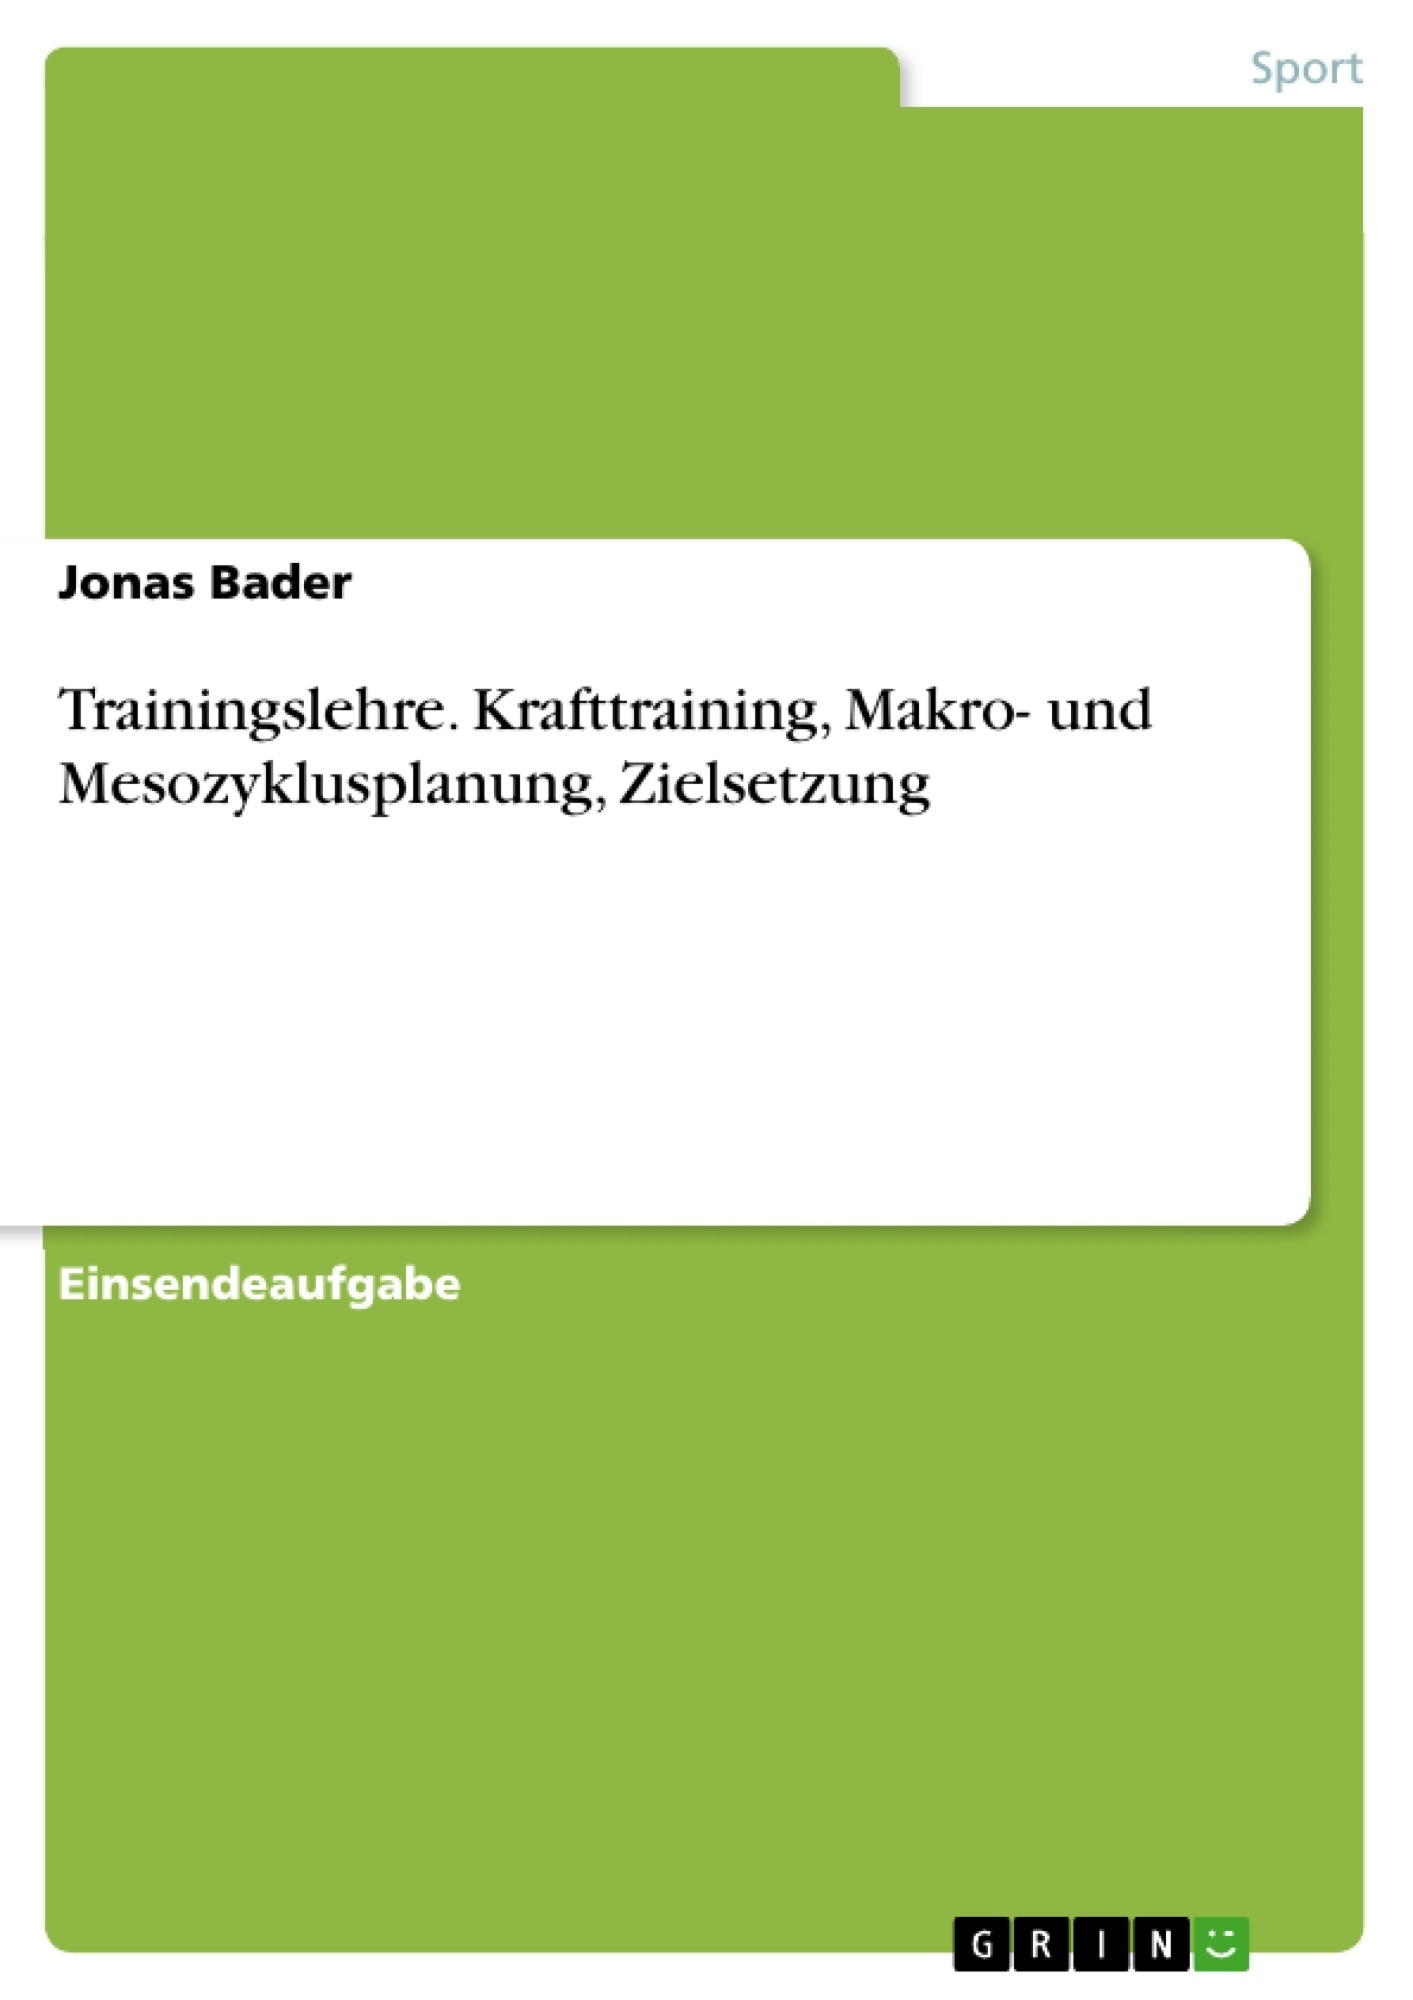 Titel: Trainingslehre. Krafttraining, Makro- und Mesozyklusplanung, Zielsetzung